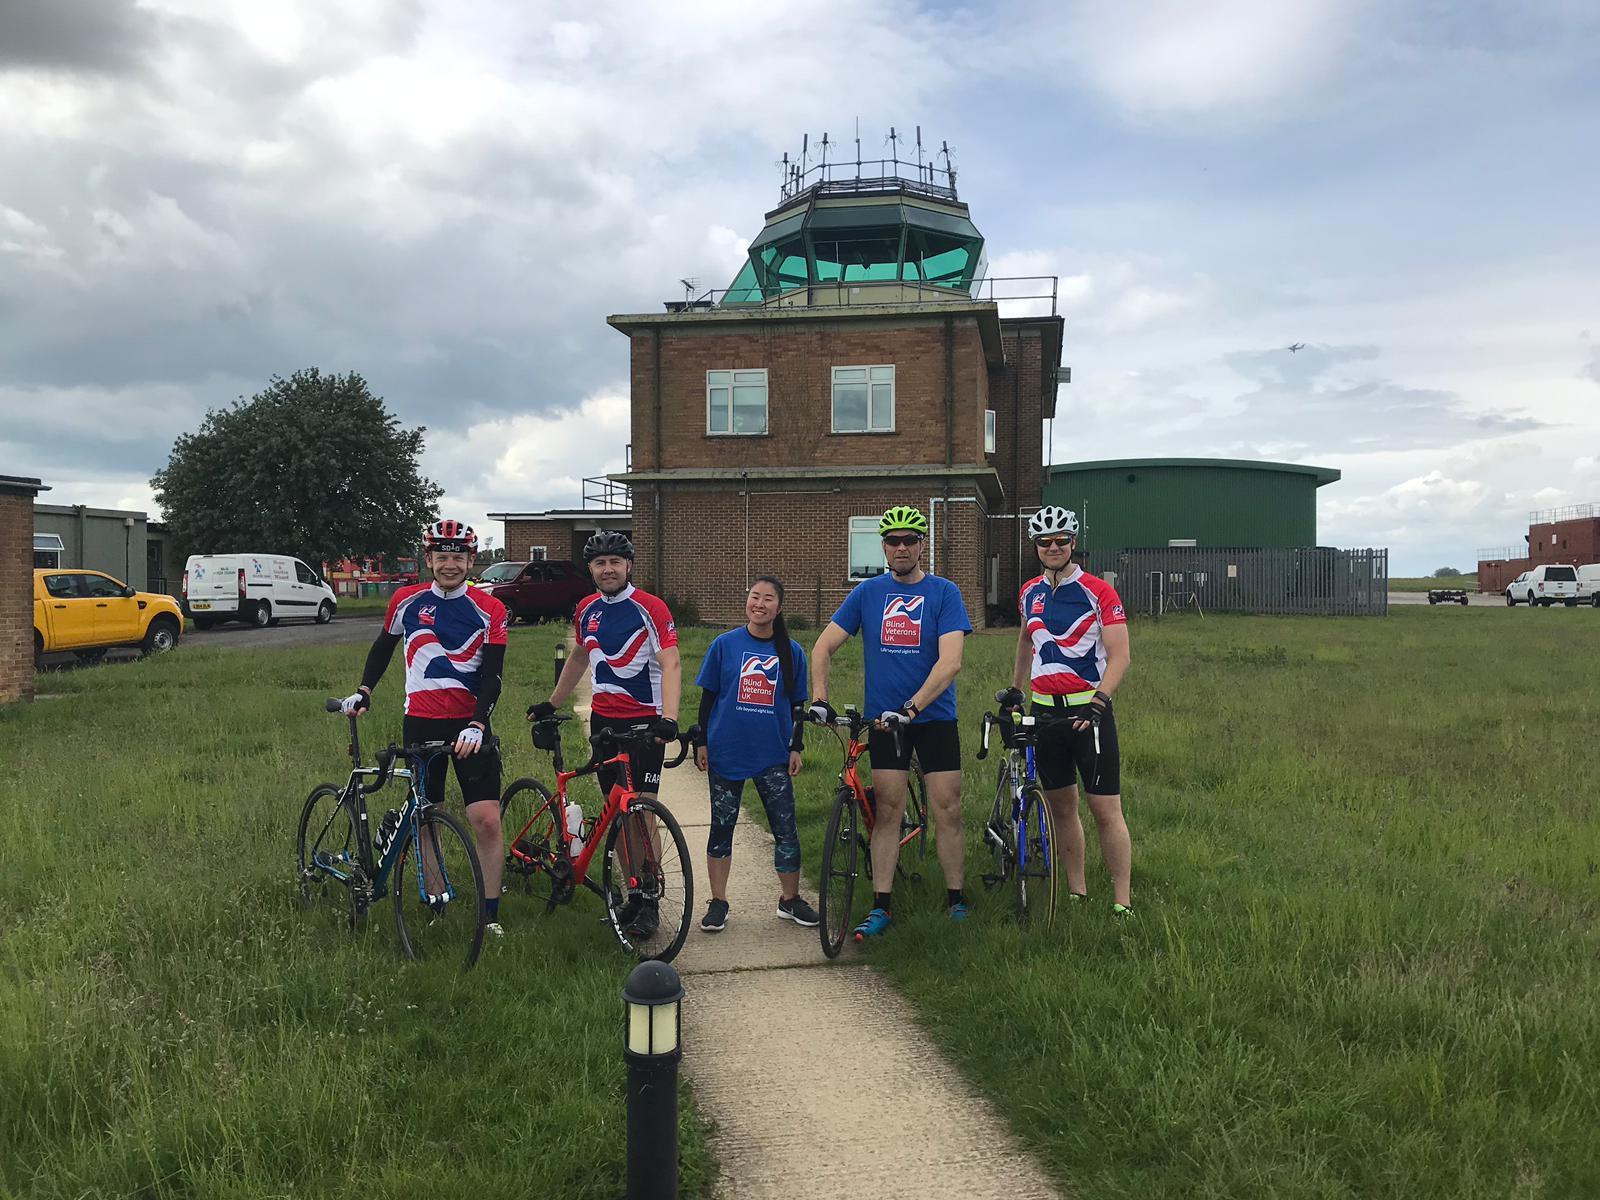 RAF sergeant rides around Brize Norton base for Blind Veterans UK